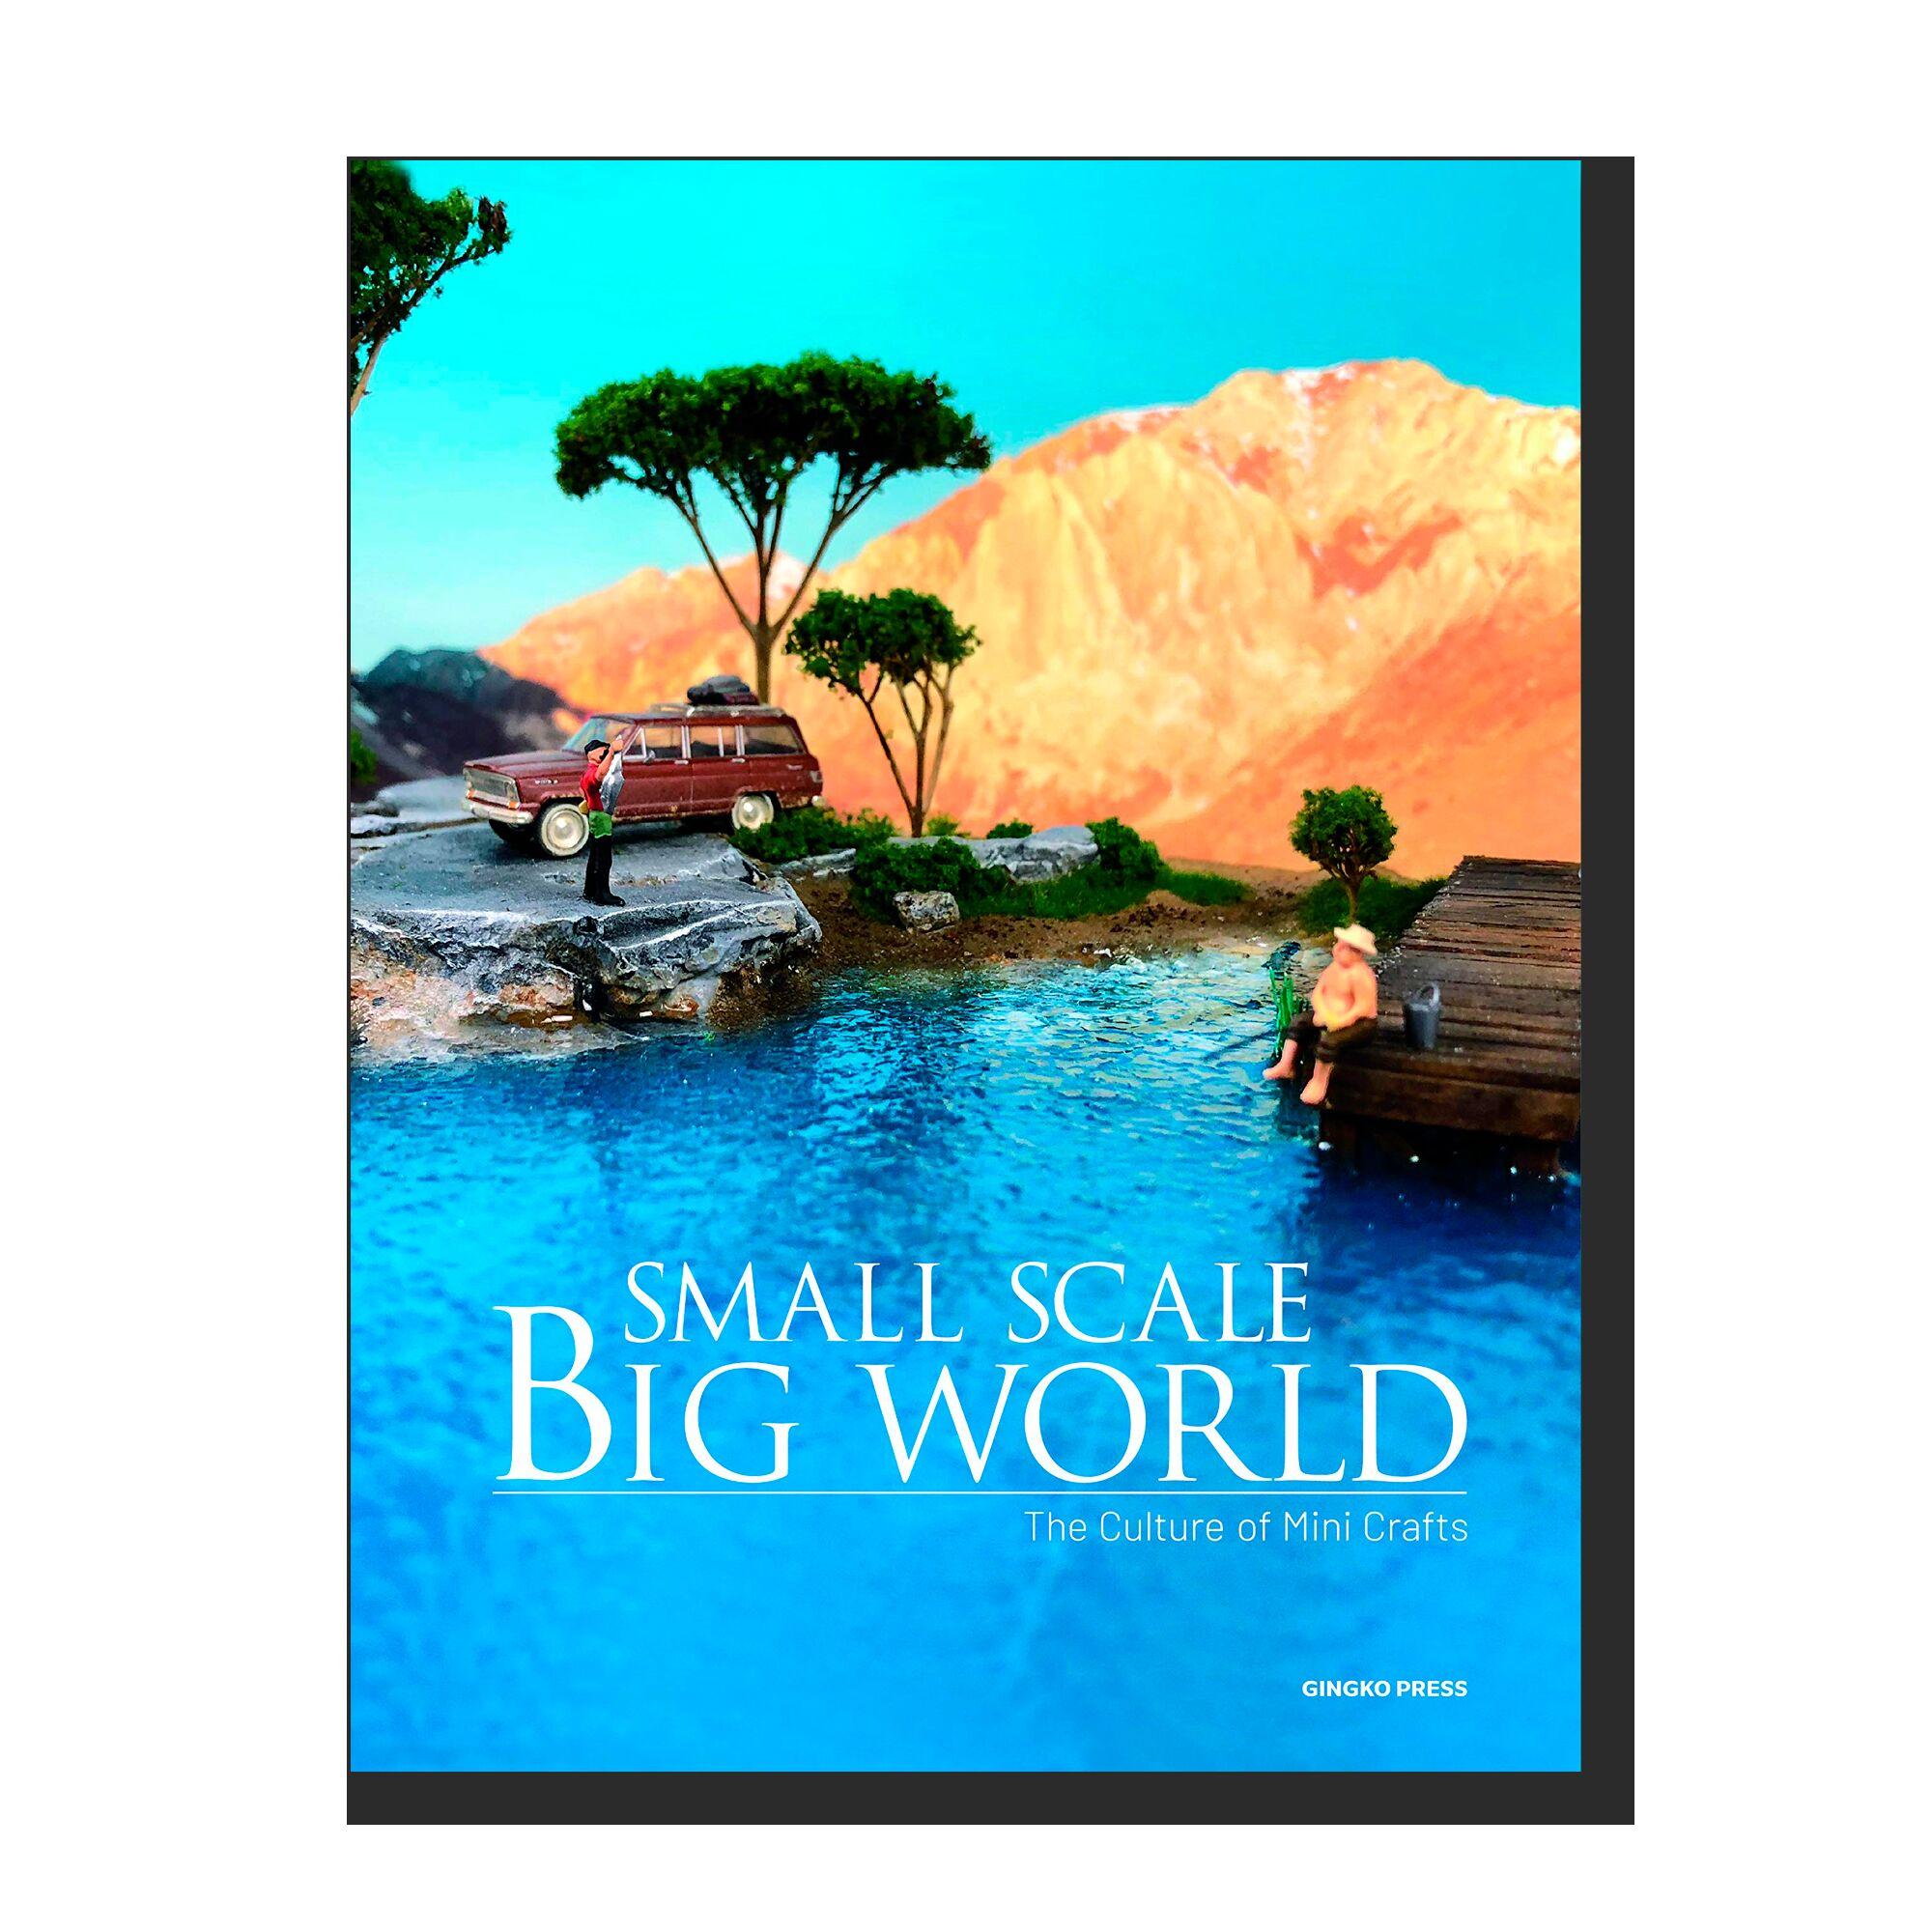 Small Scale, Big World: The Culture of Mini Crafts